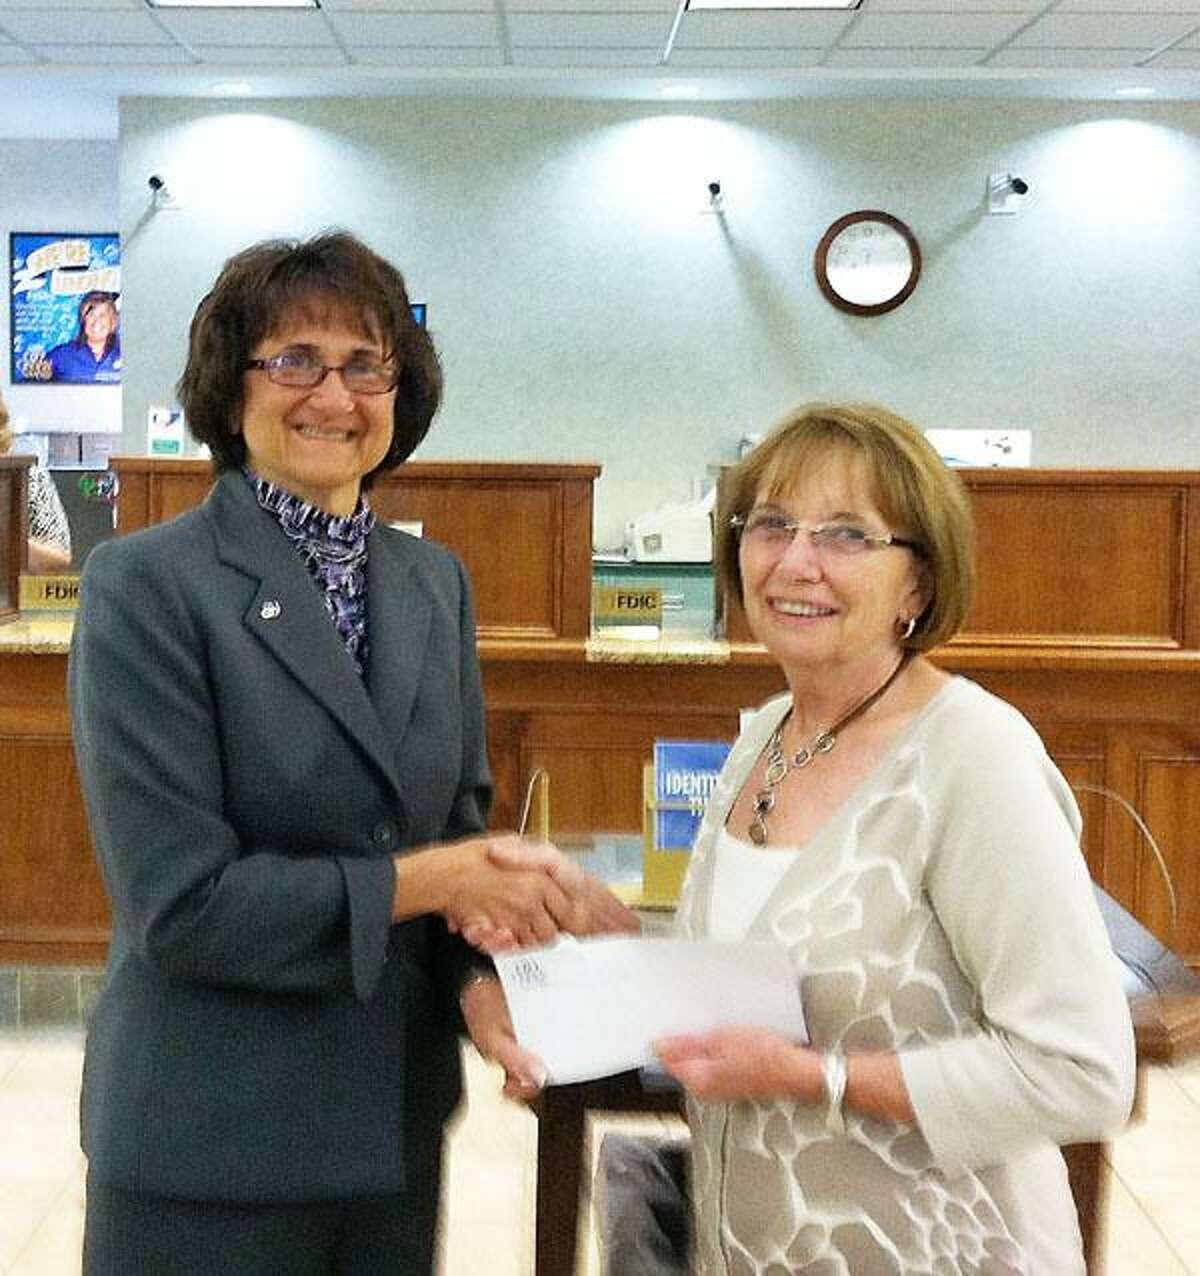 Photo Courtesy ONEIDA SAVINGS BANK Diane Karan, vice president and regional lender at Oneida Savings Bank, gives a donation to Judy Parker, tax program coordinator, RSVP of Madison County.